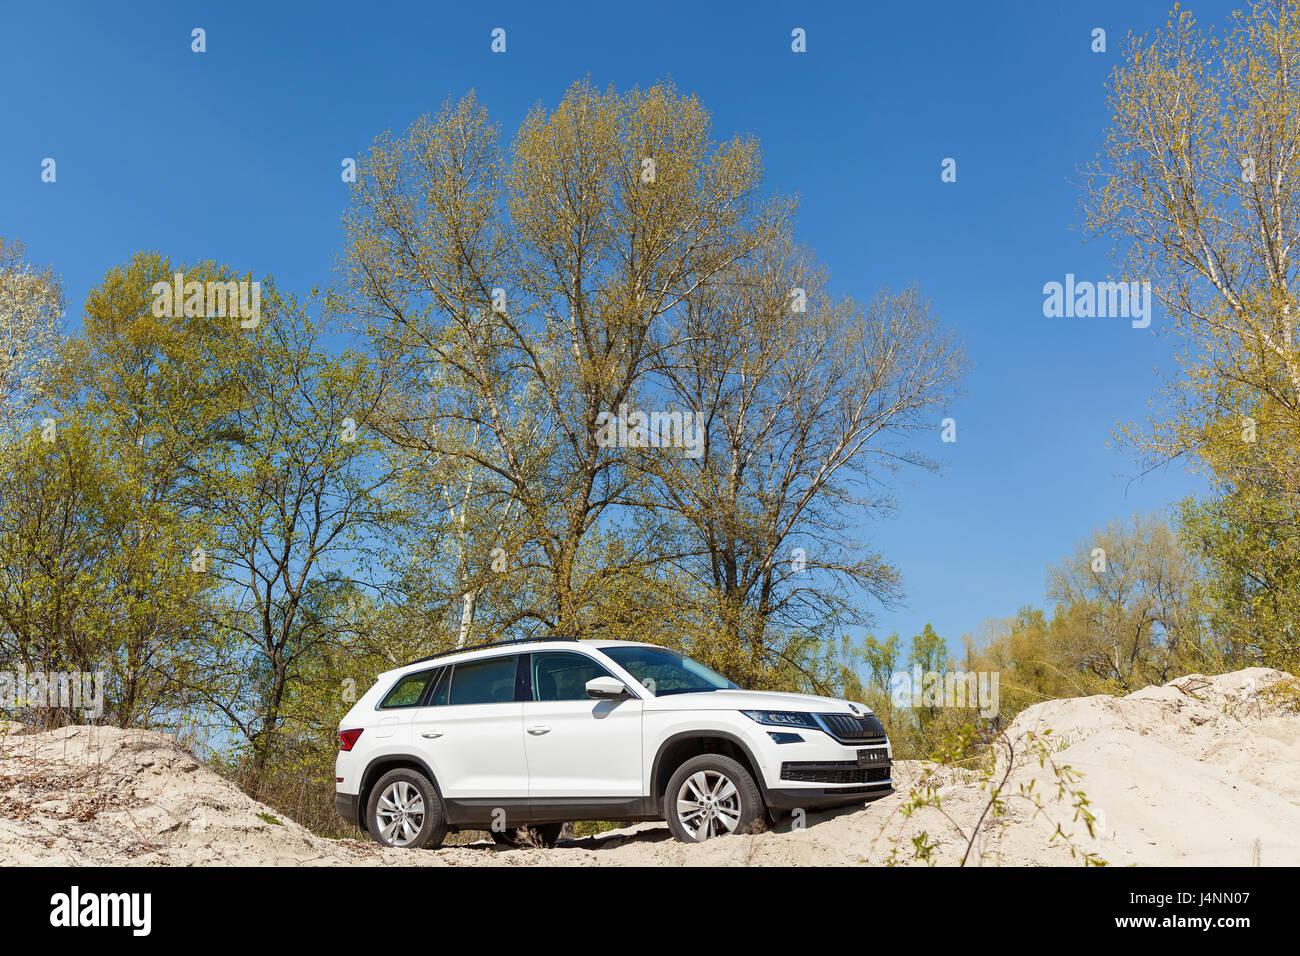 Ukraine, Kyiv 25 april 2017  car Skoda Kodiaq 2.0 TDi model year 2017 test drive  of car on sand - Stock Image